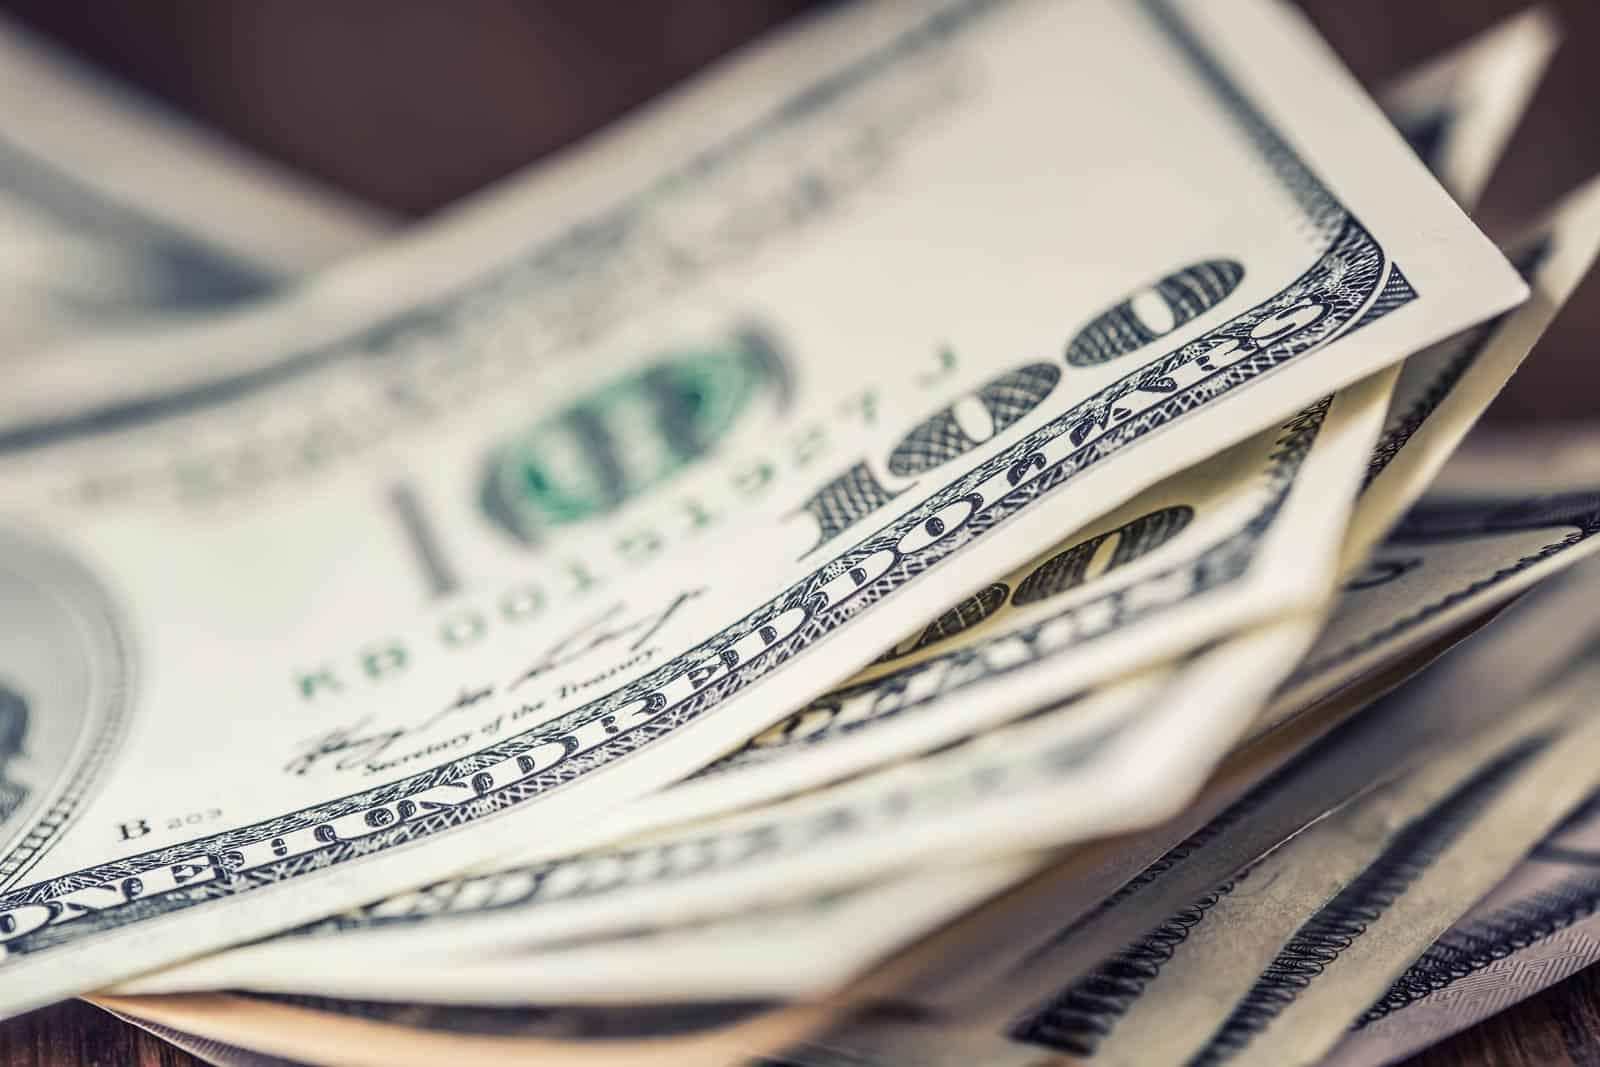 Brzi krediti splitska banka